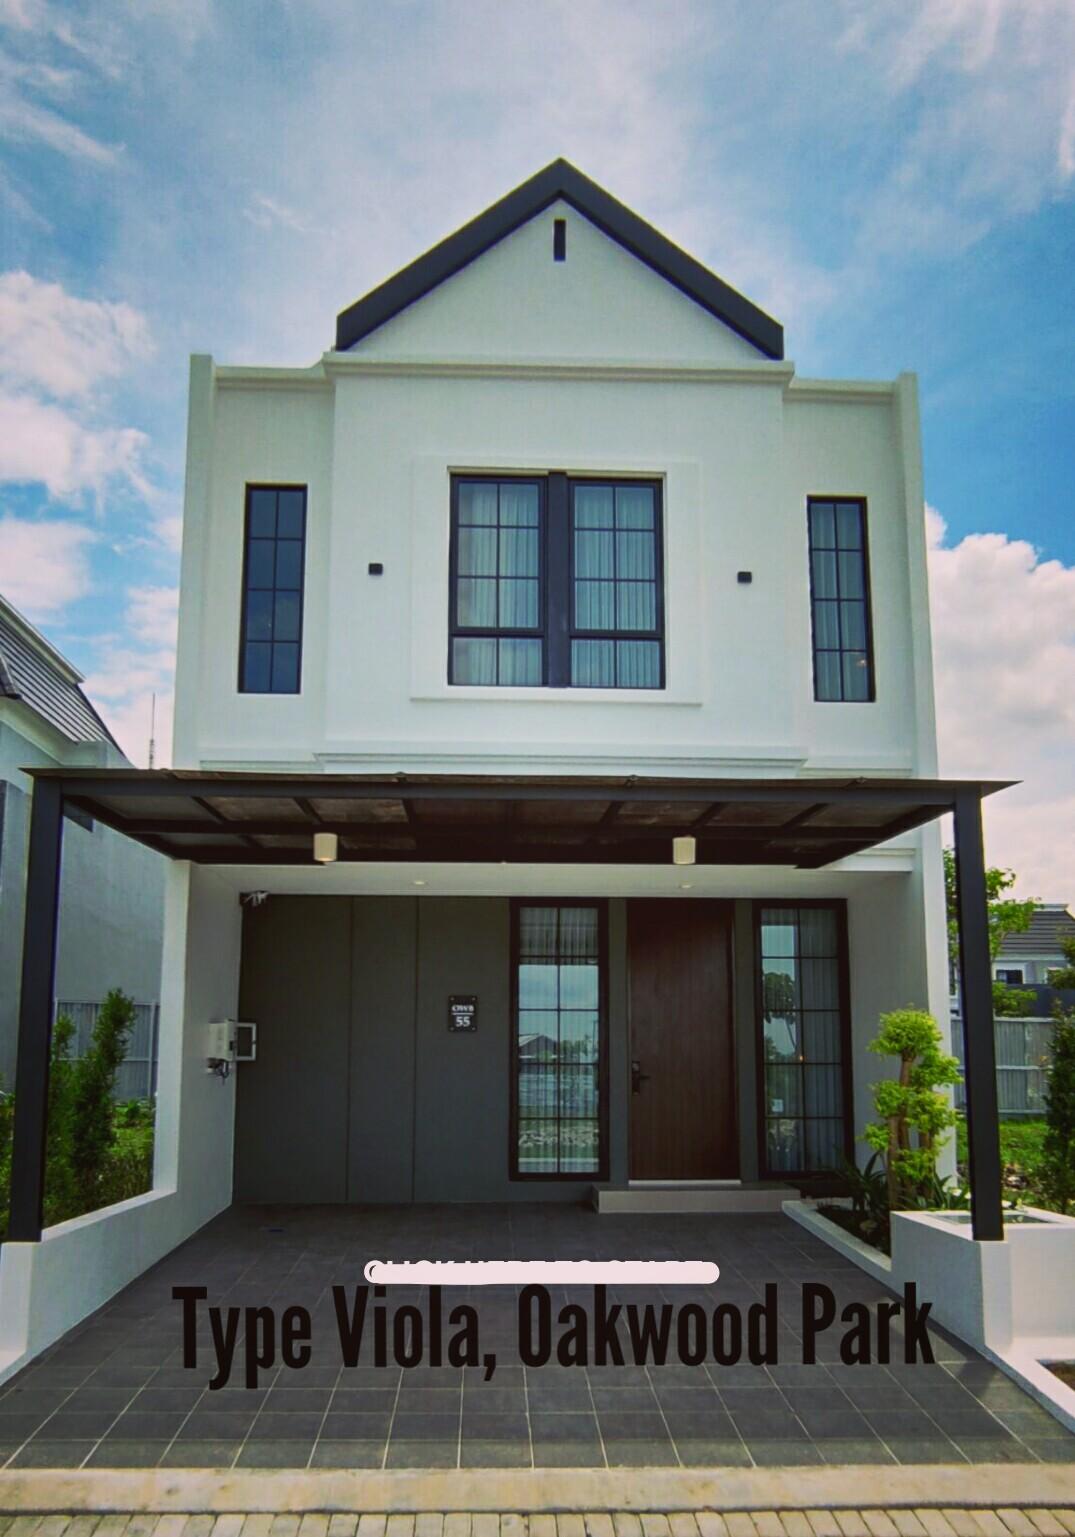 Rumah Modern Minimalis, Type Viola, Oakwood Park, Citraland Utama, Surabaya